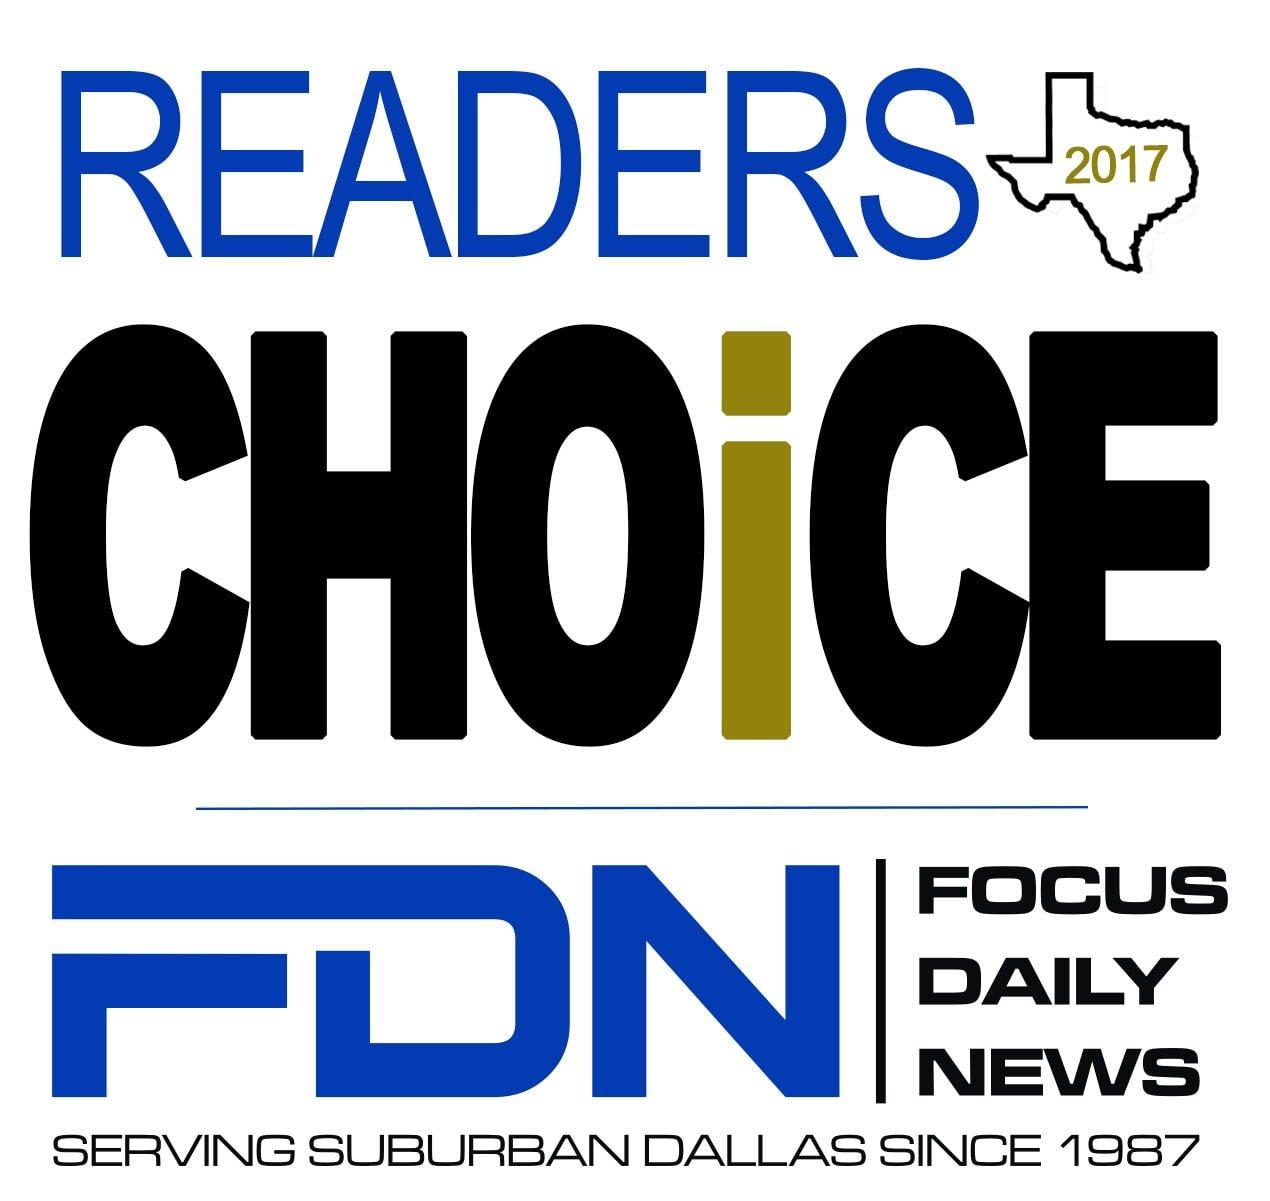 2017 readers choice awards logo